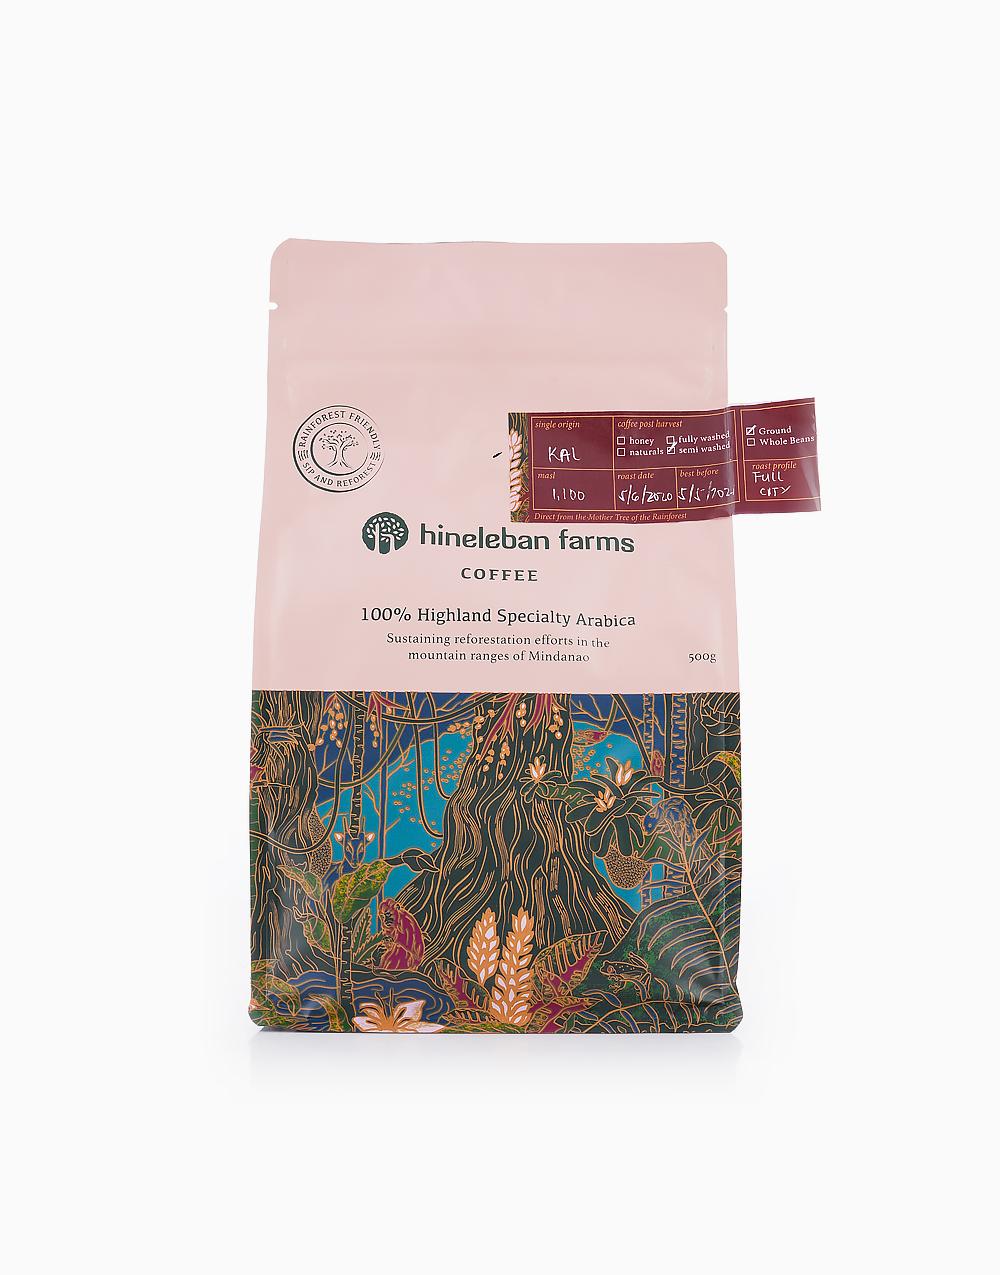 Ground Coffee (500g) by Hineleban Farms